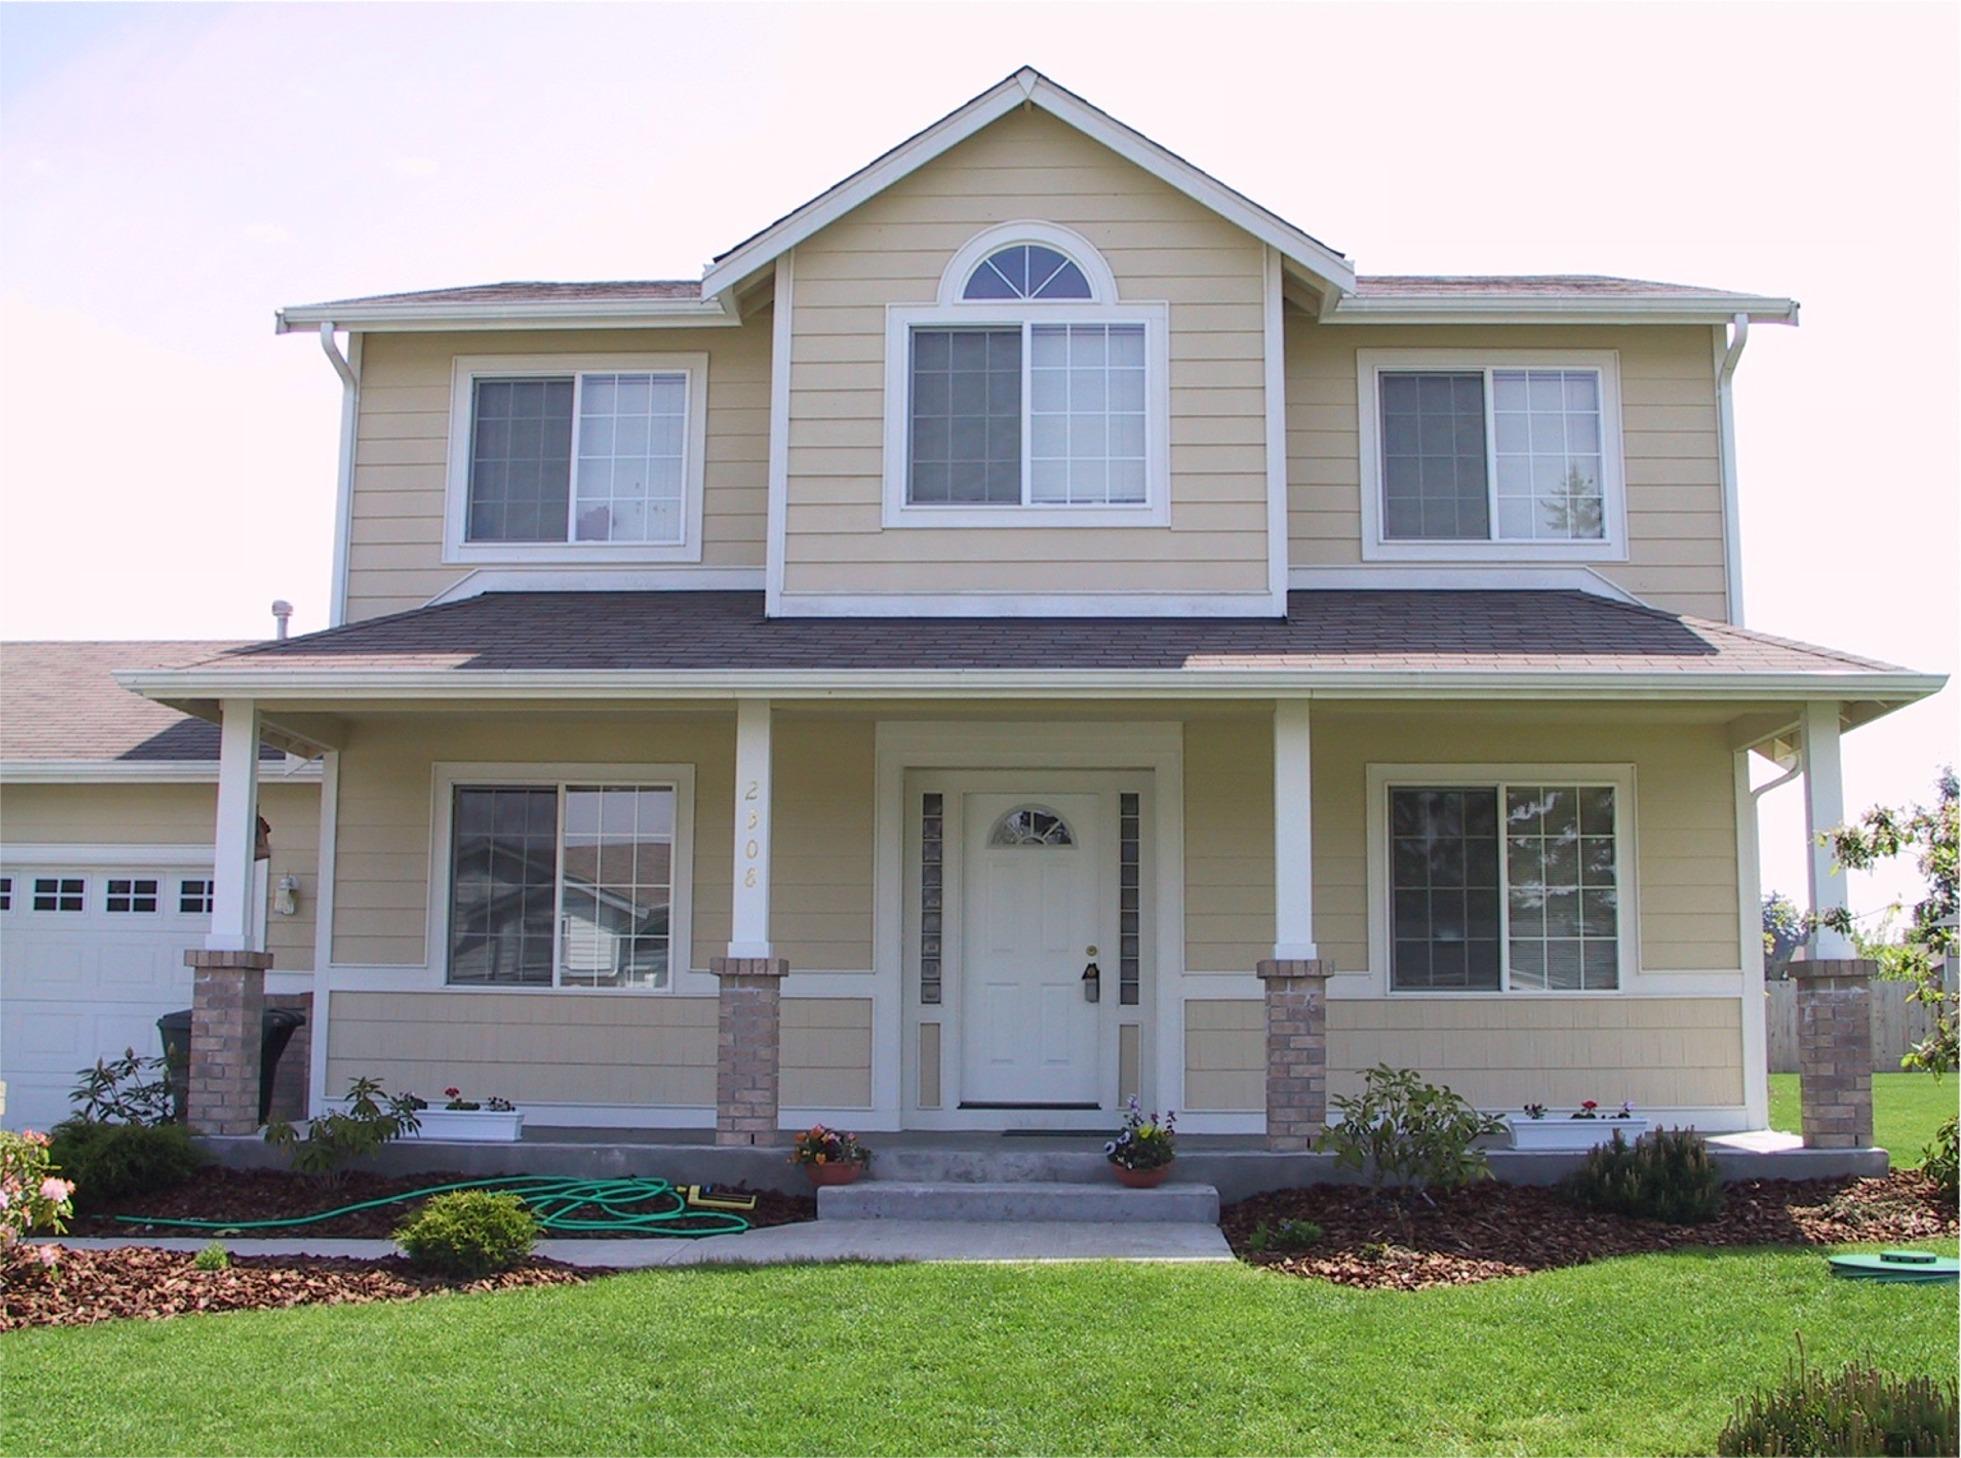 Real Estate Marketing | Single Property Sites